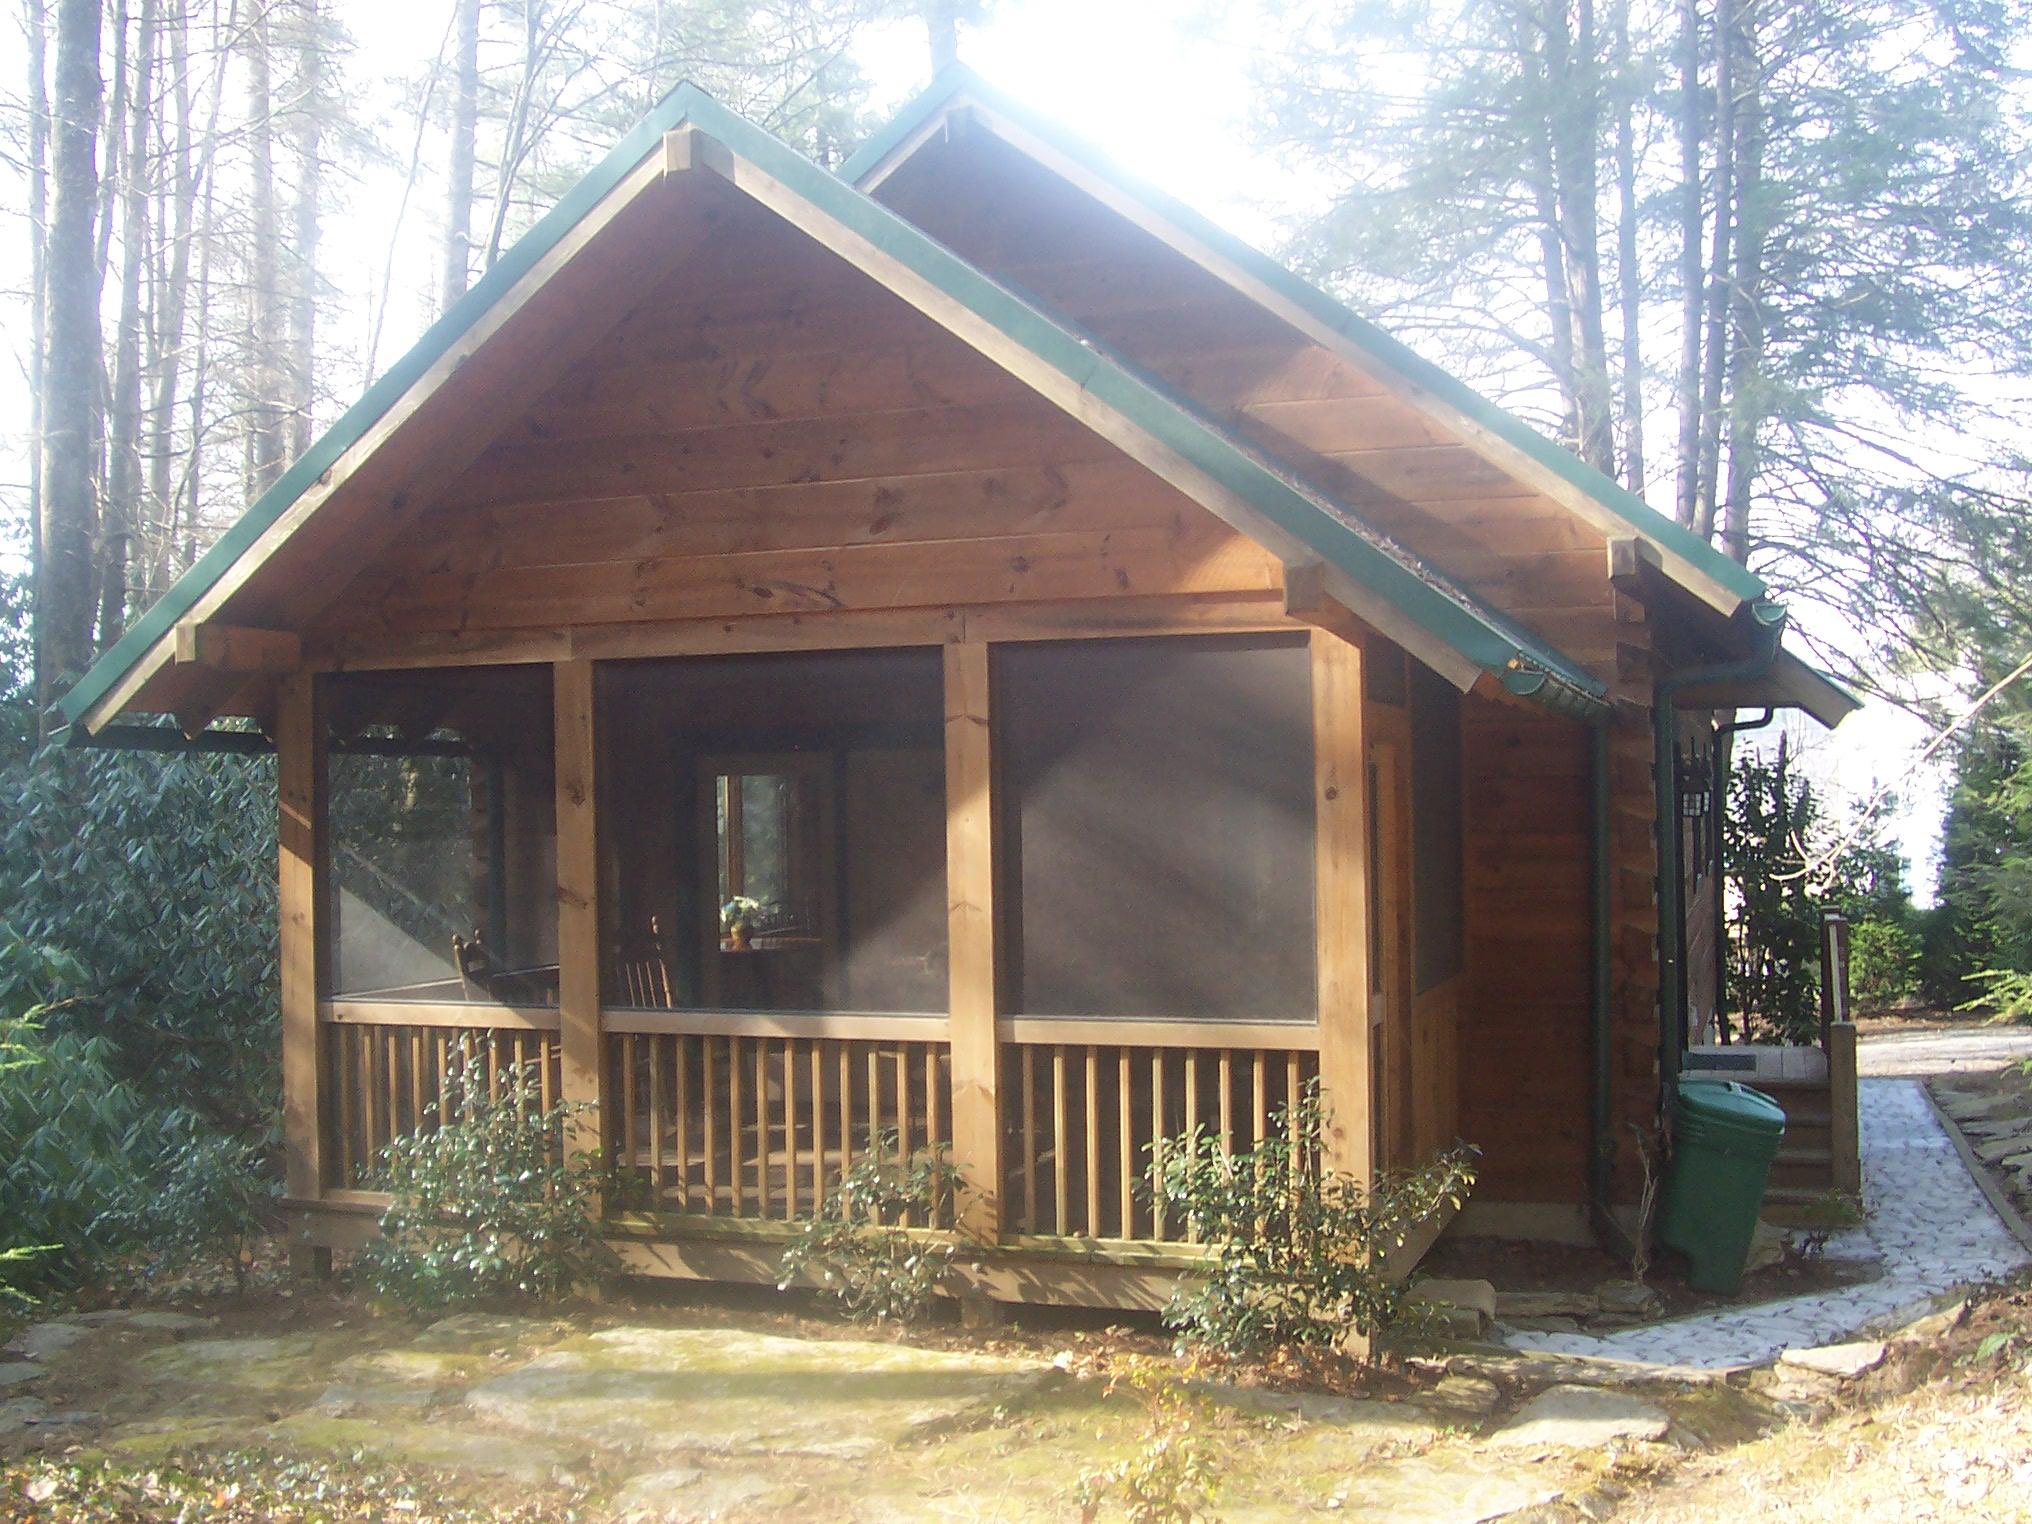 patty peppermint barkwells in bath nc river cabins mills brevard ln bedroom print cabin